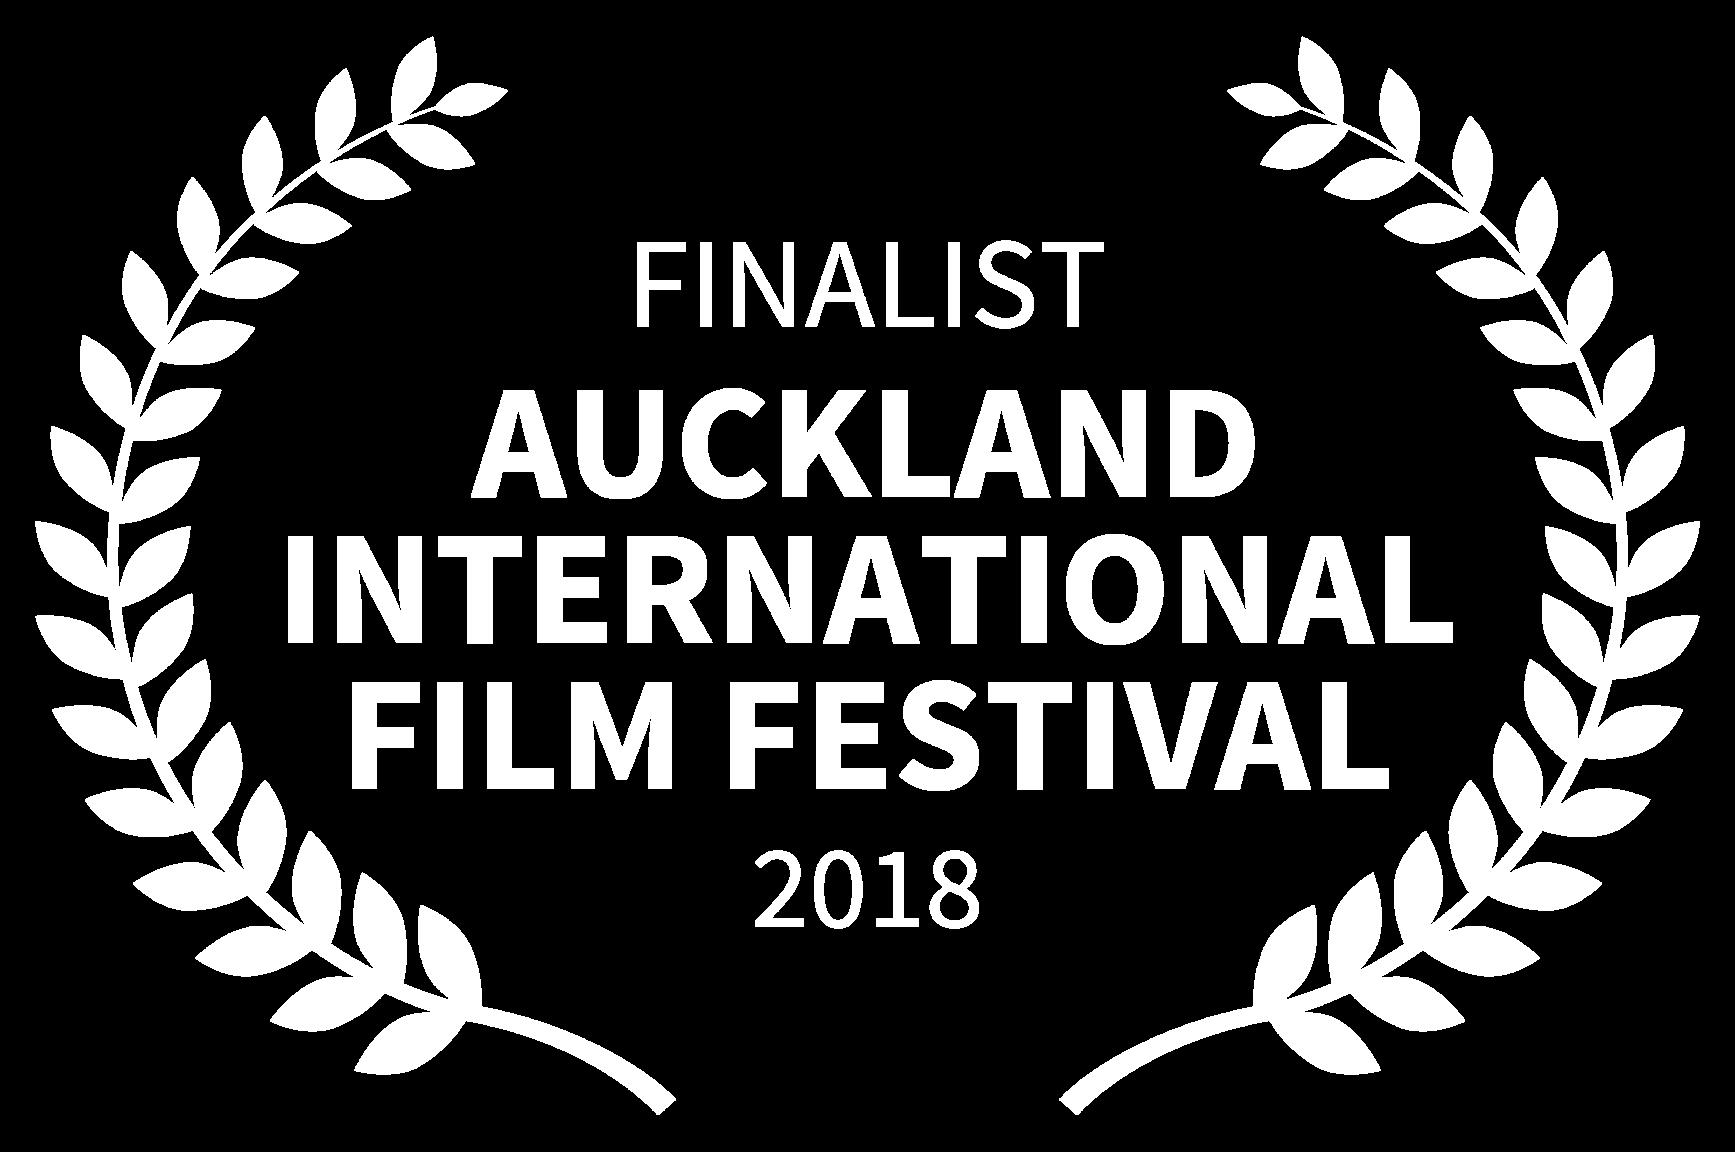 FINALIST - AUCKLAND INTERNATIONAL FILM FESTIVAL - 2018 (1).png